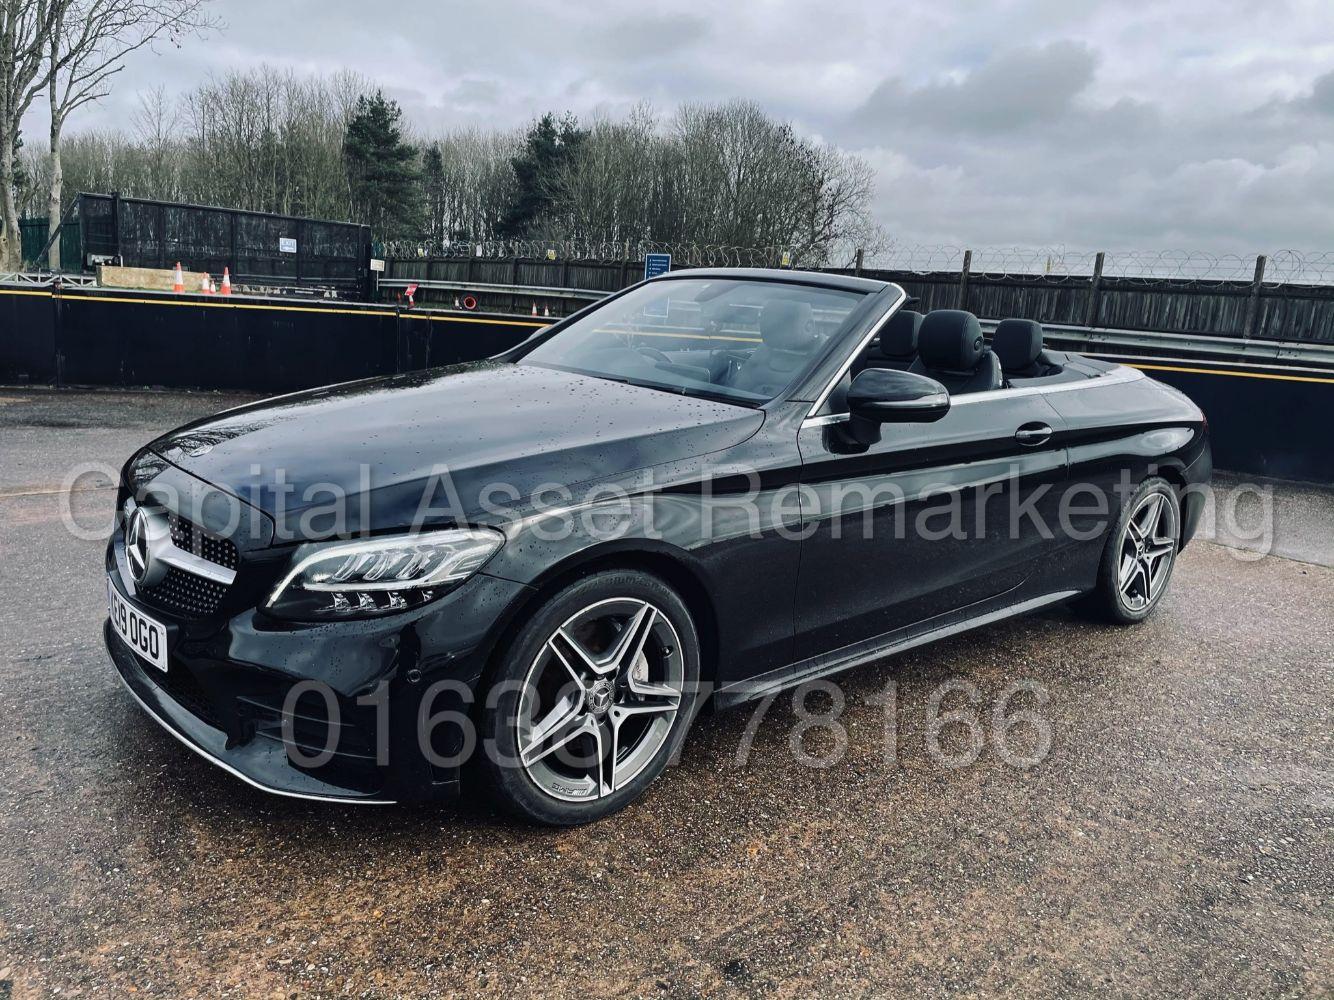 2019 Mercedes-Benz S350d *AMG Line* - 2019 Mercedes-Benz C220d *AMG Cabriolet* + Many More: Cars, Commercials & 4x4's